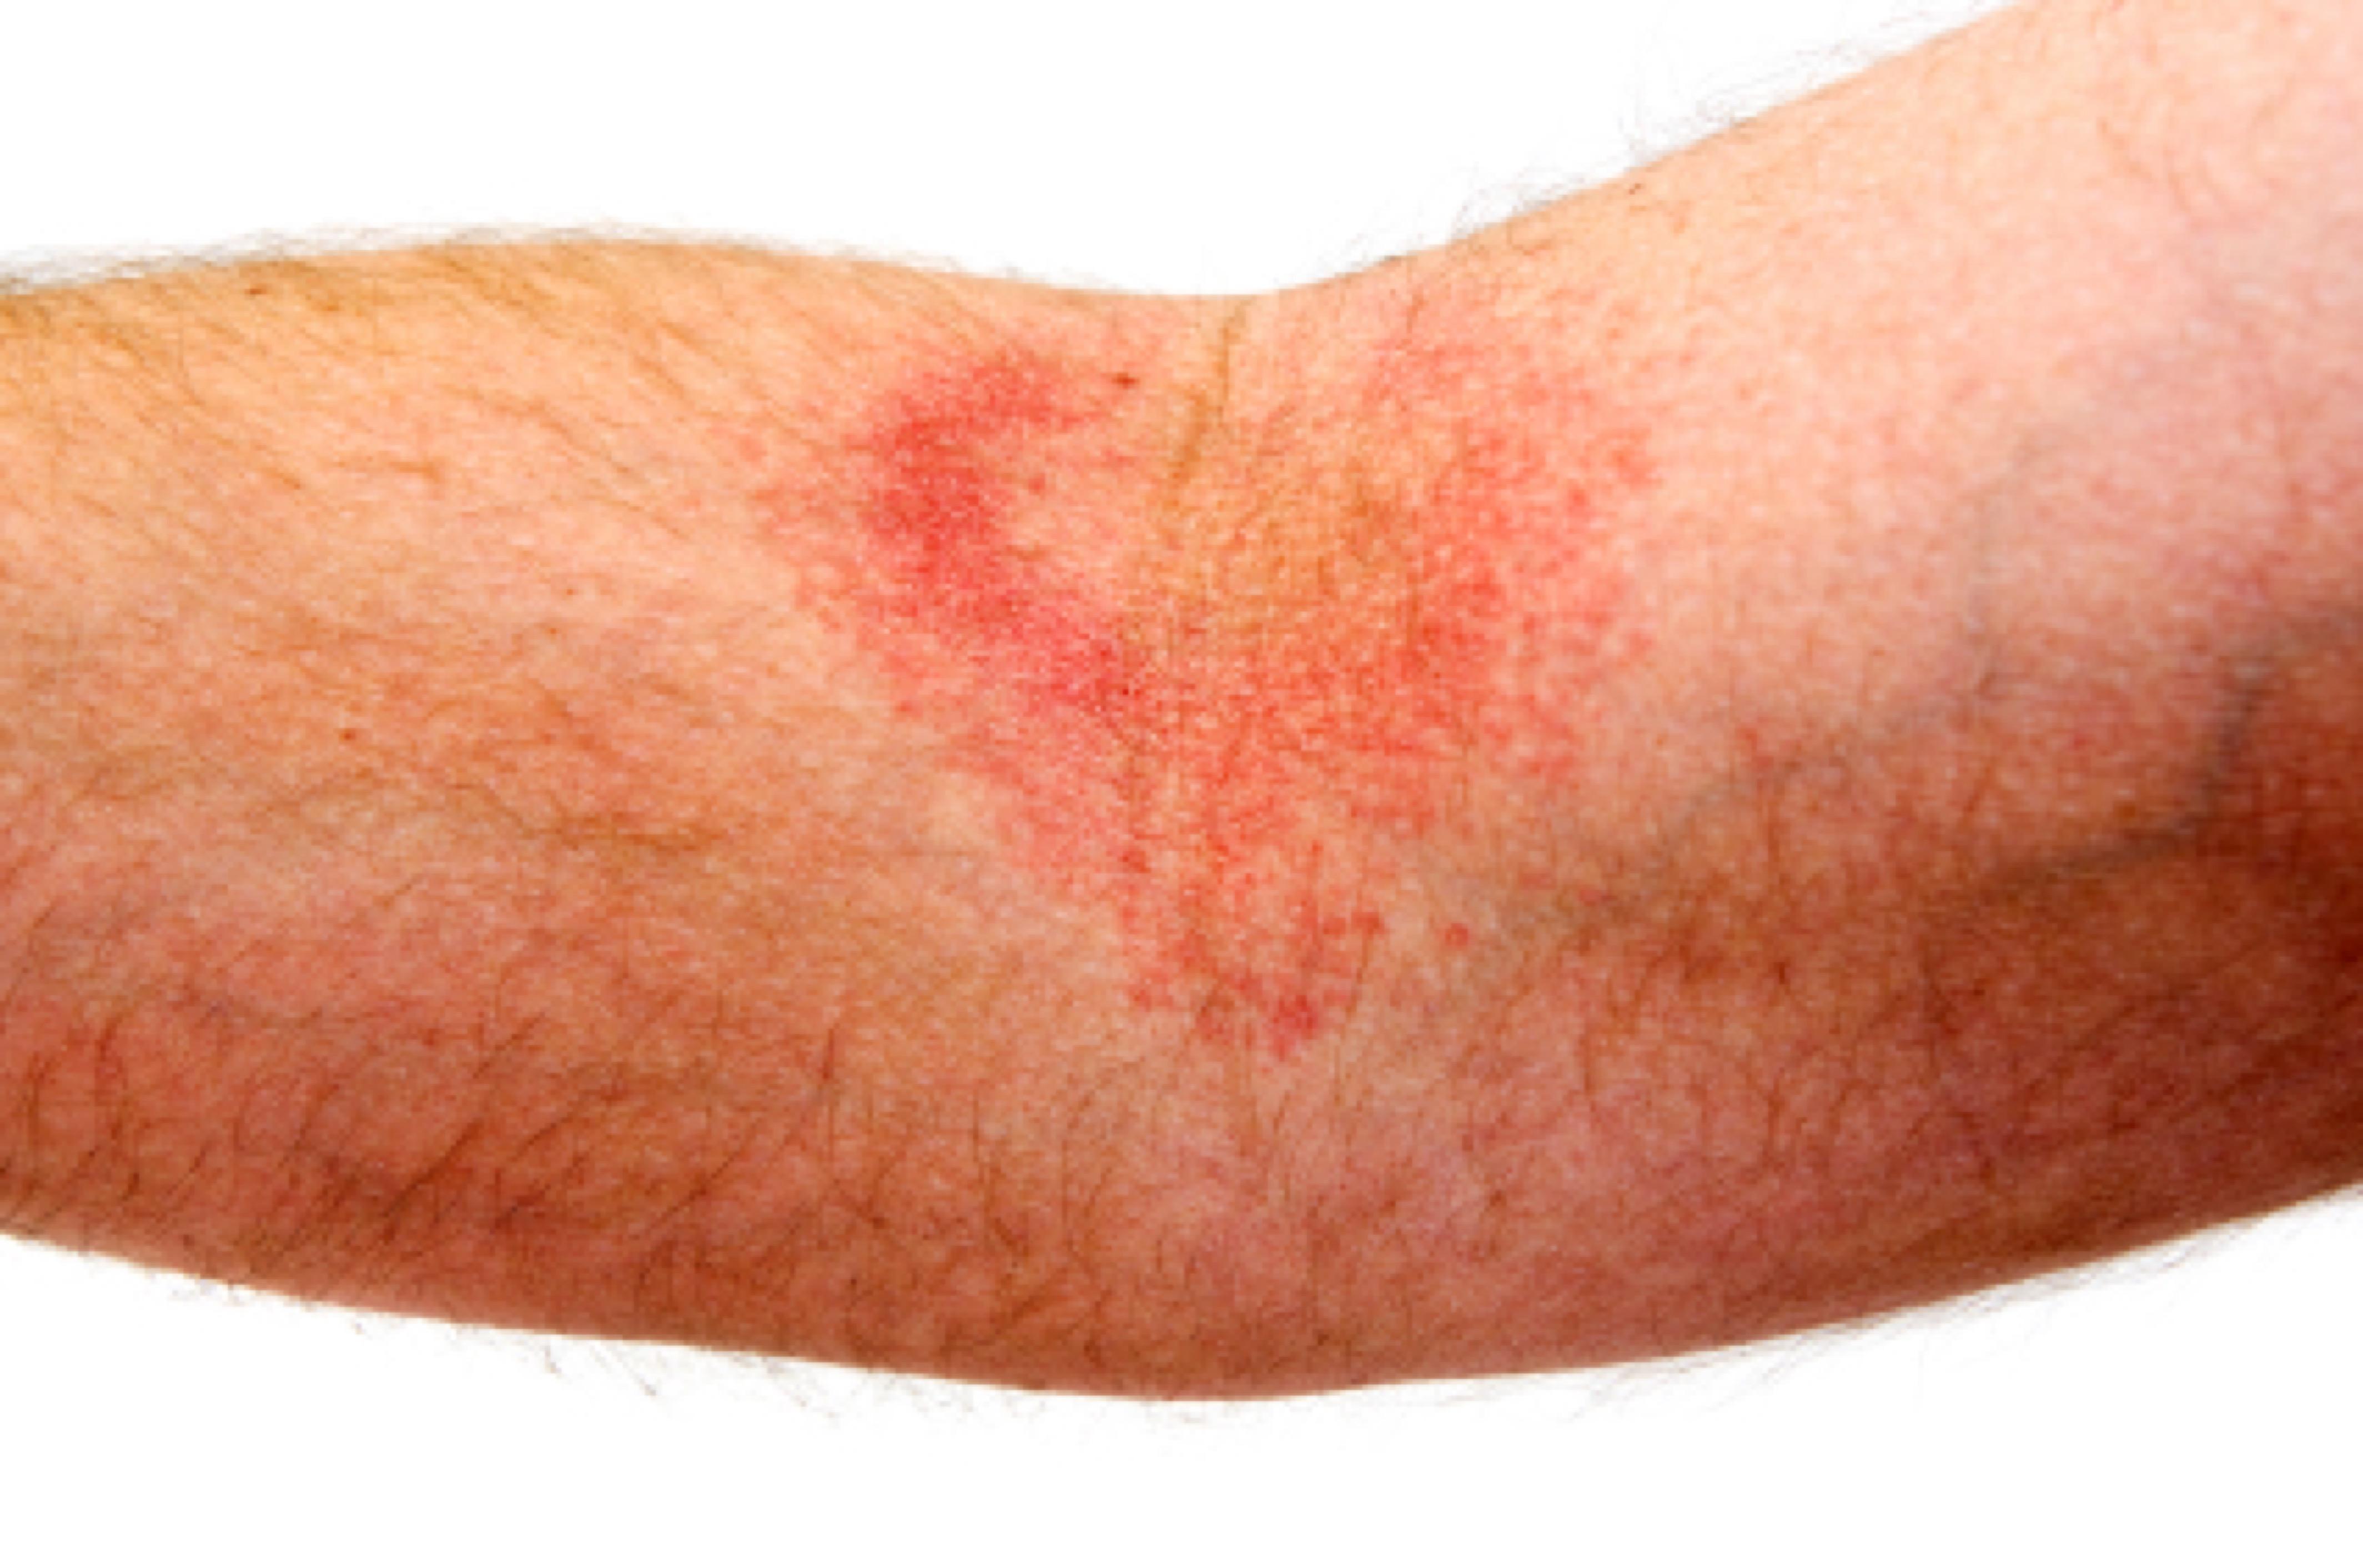 eczema on the arm